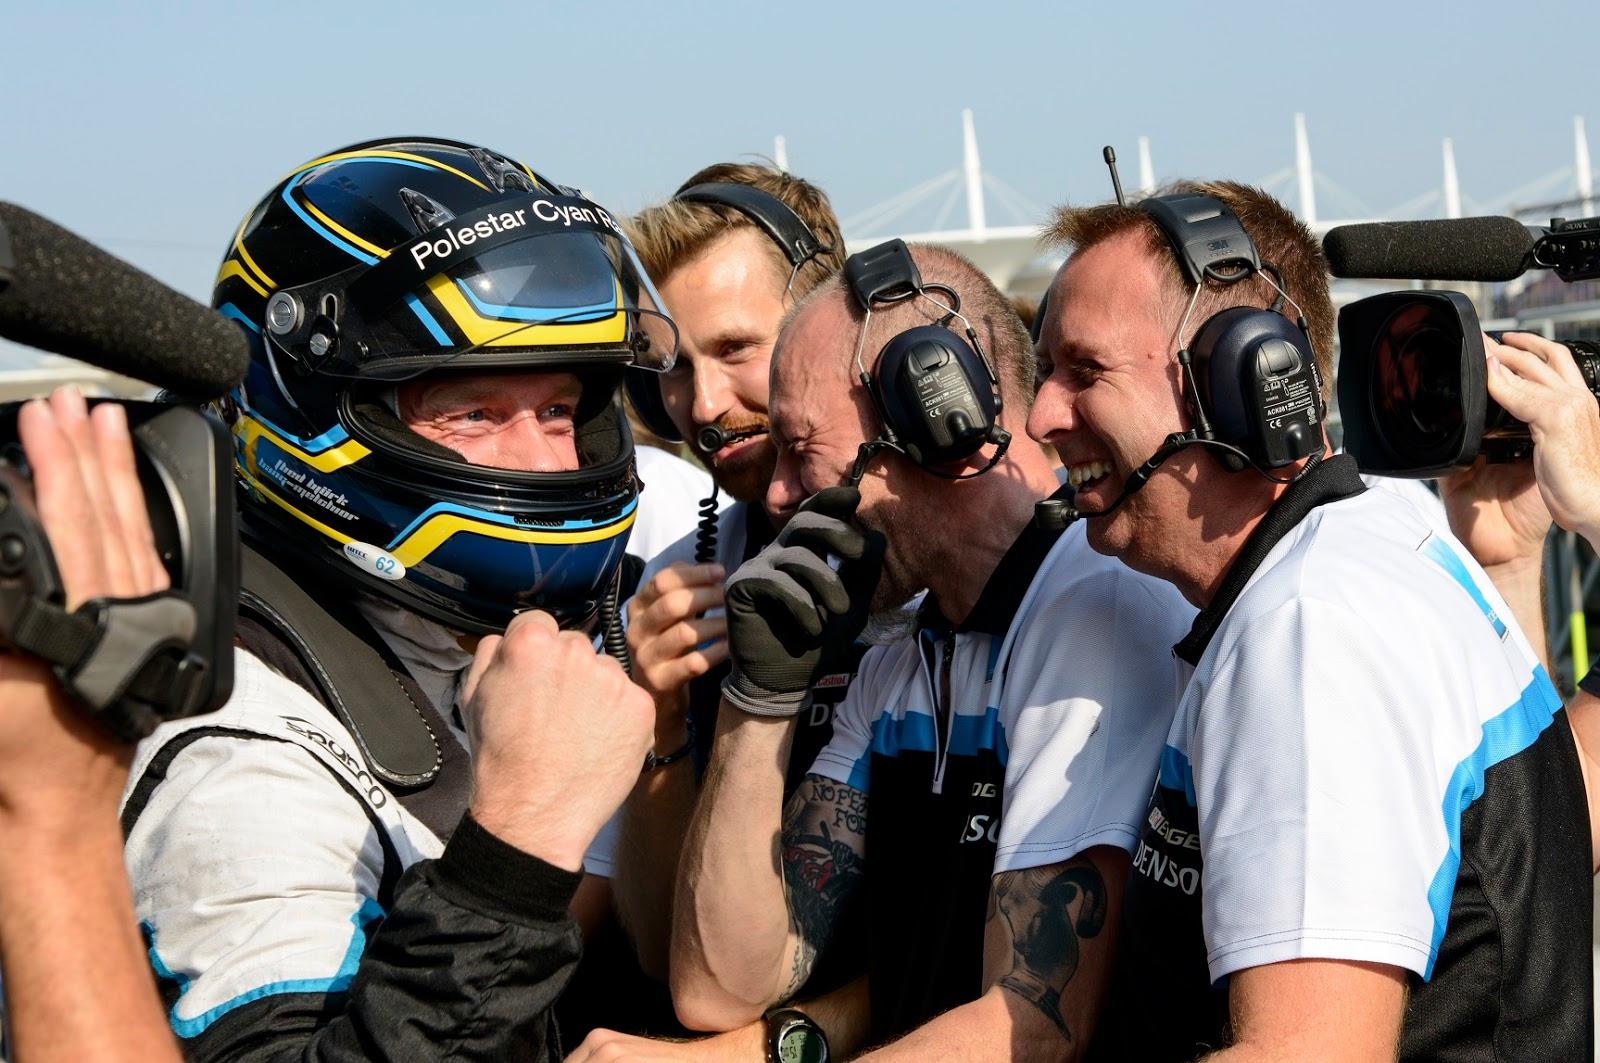 VOLVO2BNIKH2BWTCC 5 Πρώτη νίκη για τη Volvo στο WTCC FIA, Polestar, Rally, videos, Volvo, WTCC